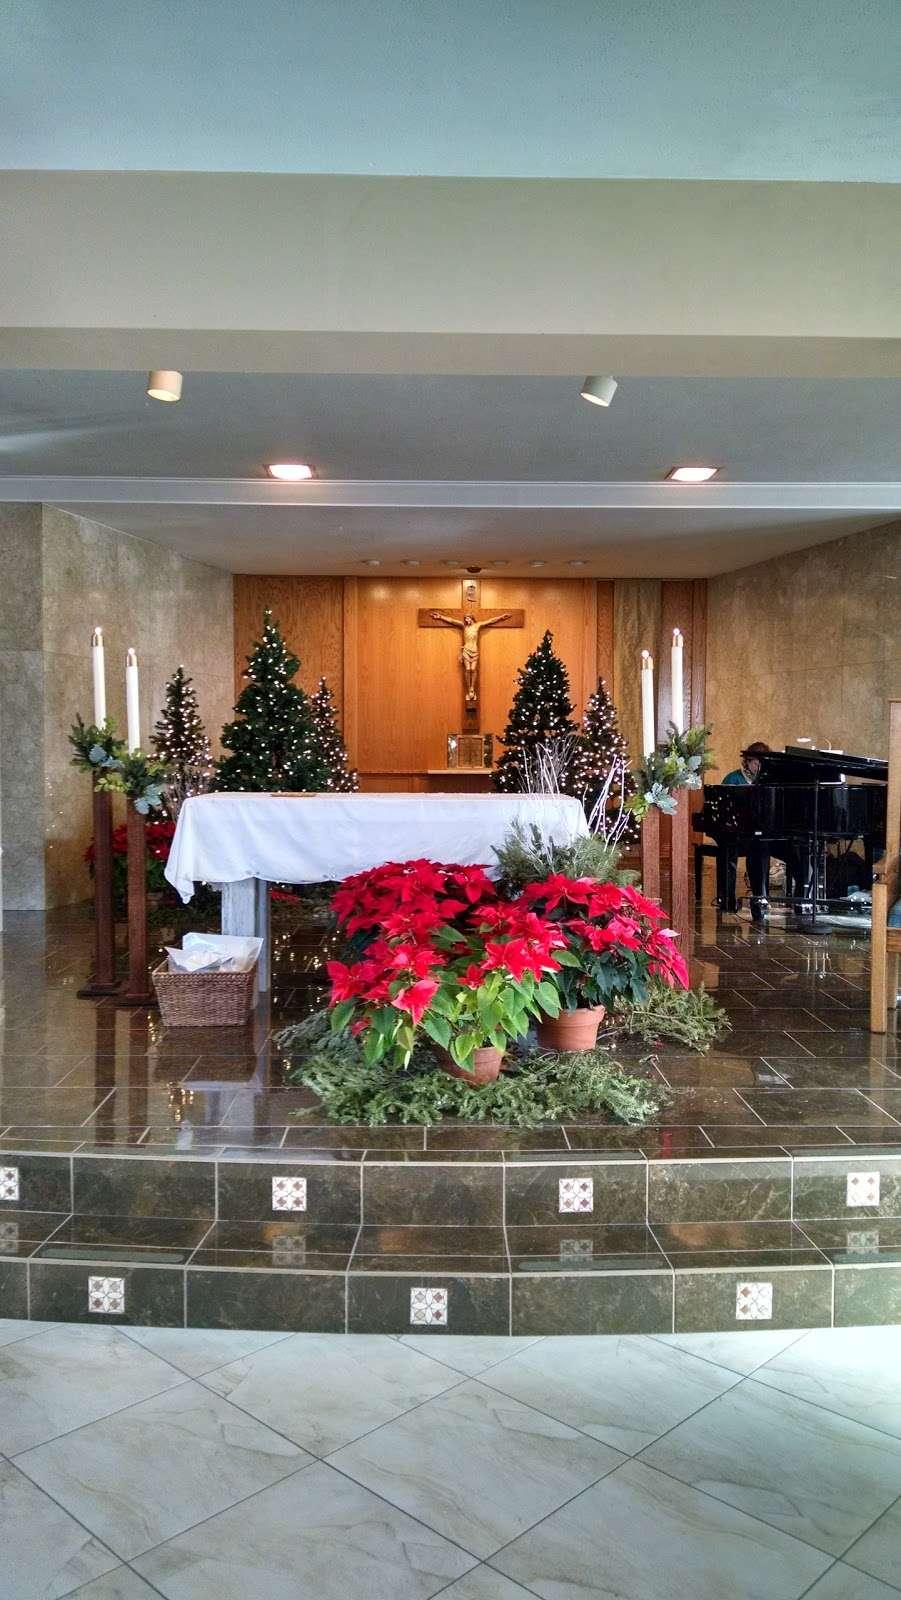 Divine Savior Catholic Church - church  | Photo 5 of 10 | Address: 7740 W Montrose Ave, Harwood Heights, IL 60706, USA | Phone: (708) 456-9000